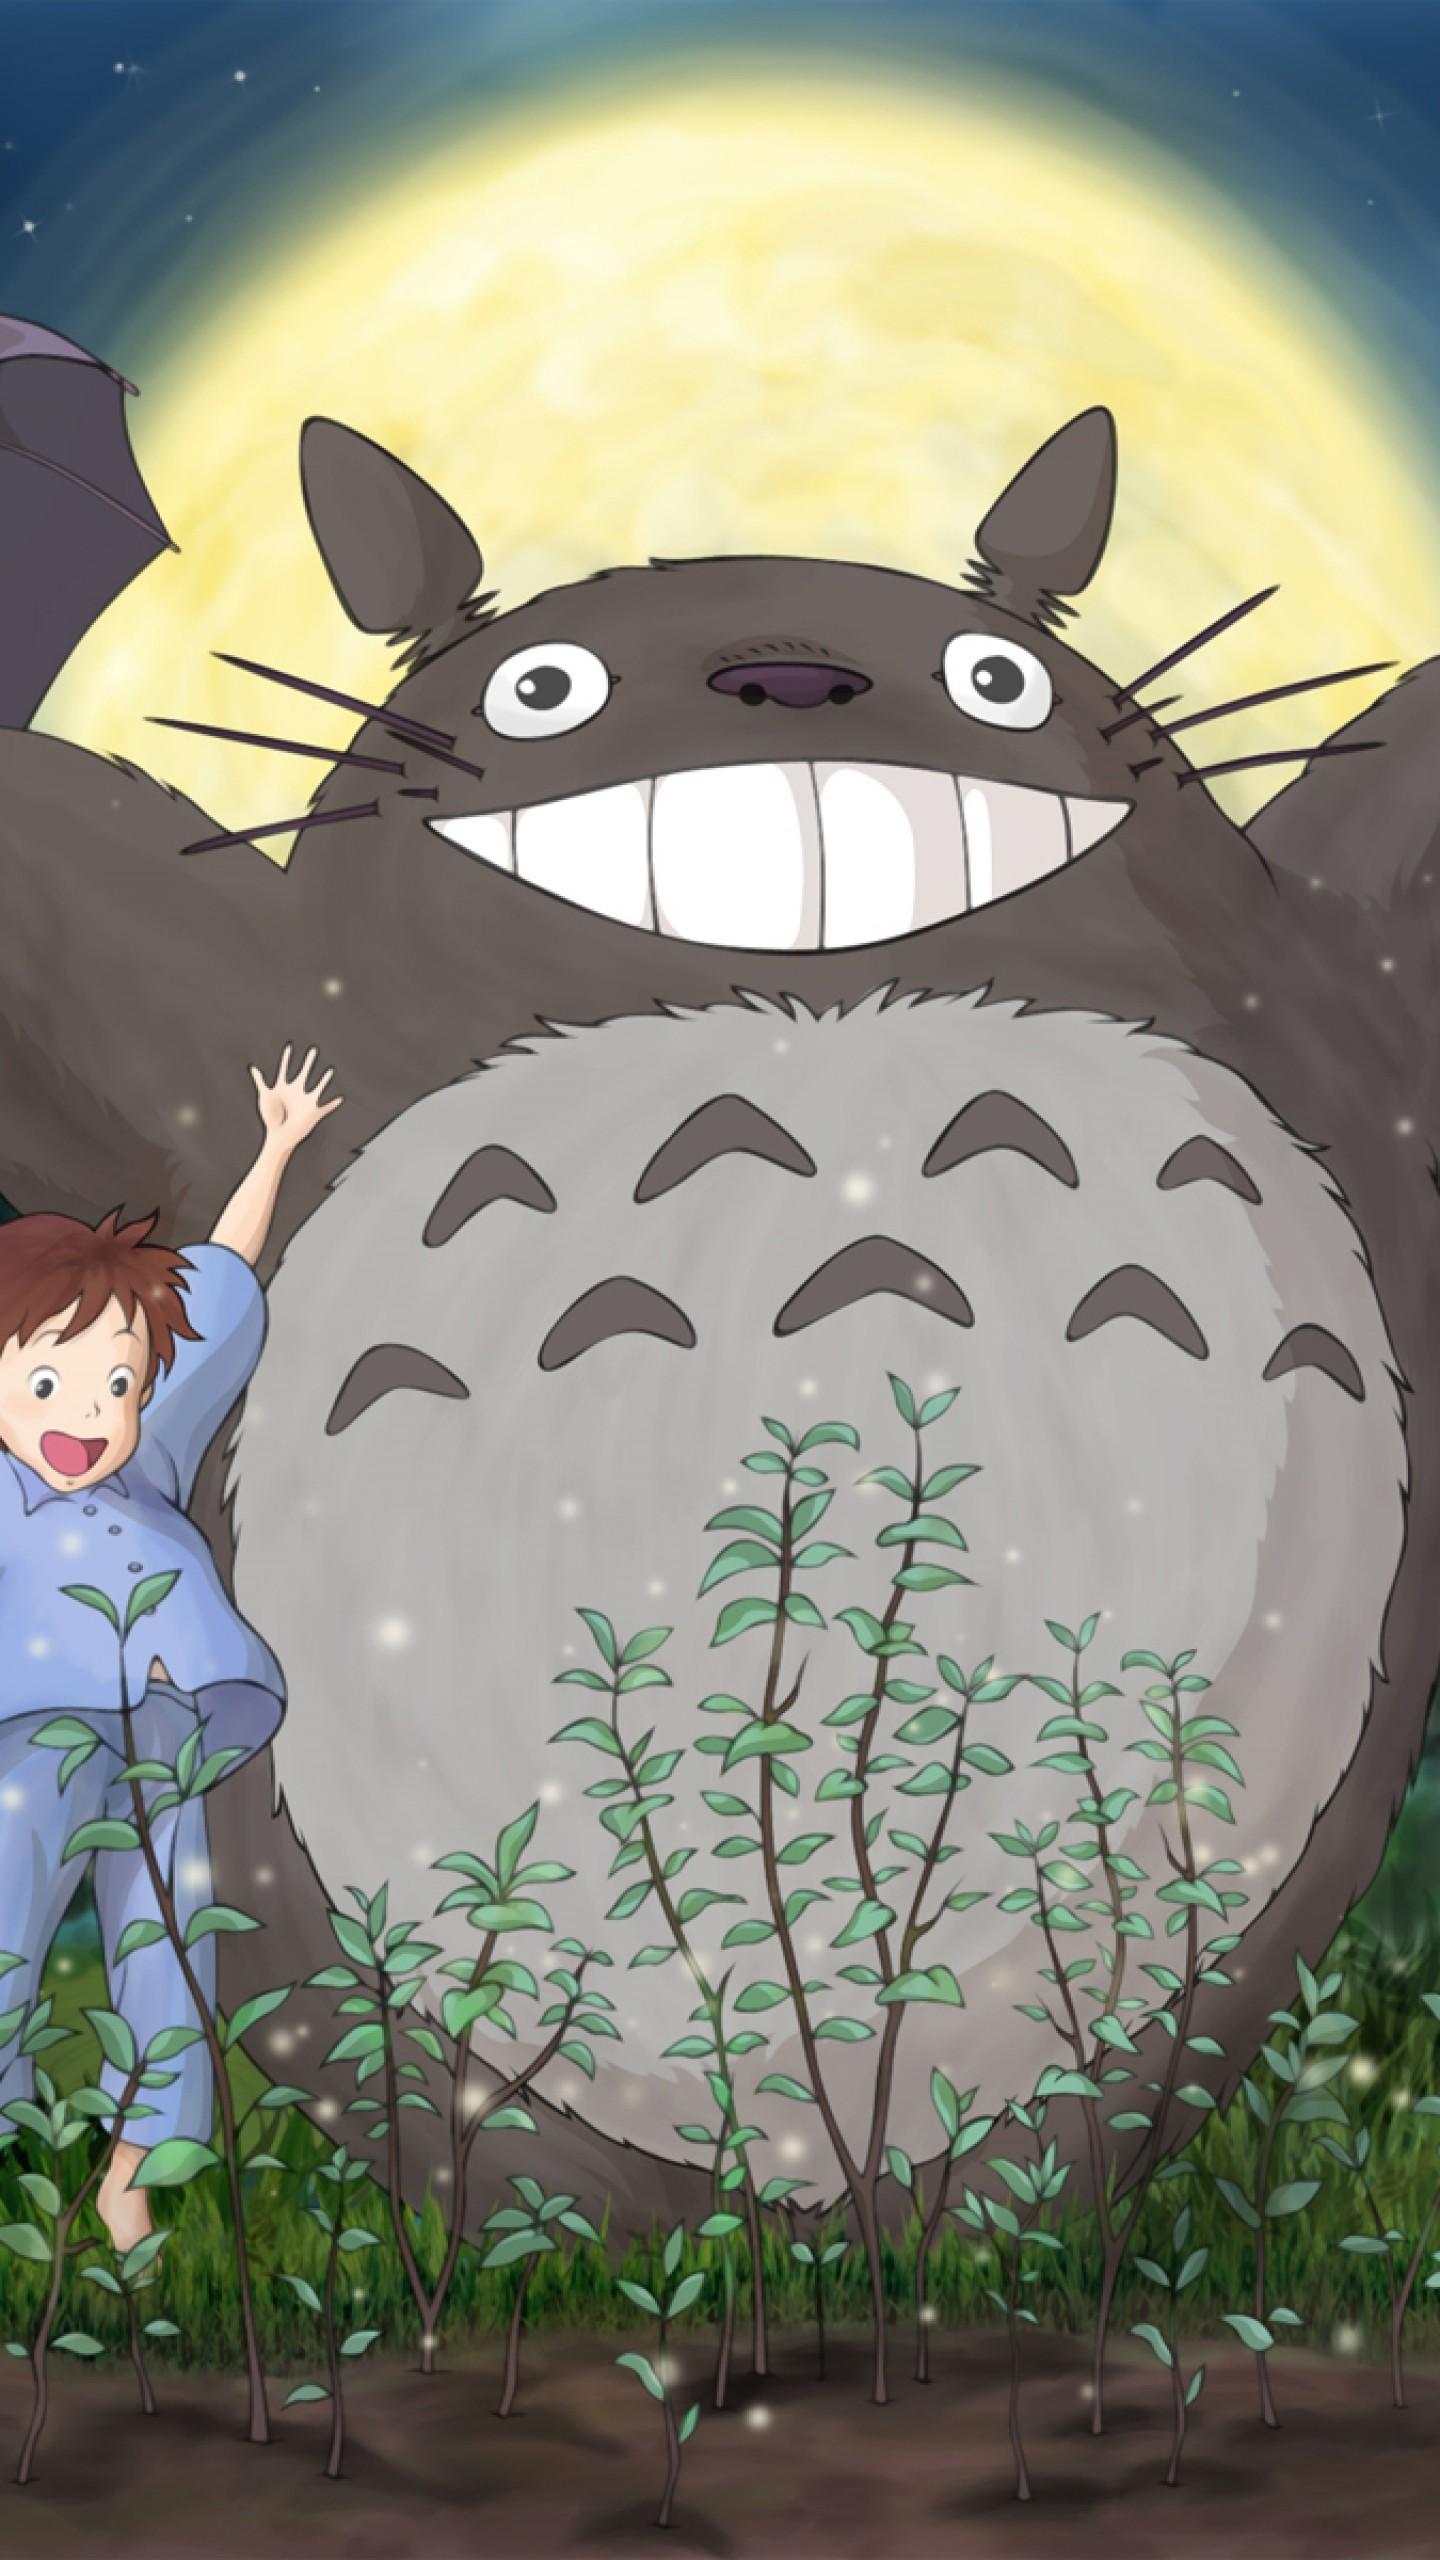 Preview wallpaper ghibli, my neighbor totoro, mei, satsuki, totoro, forest,